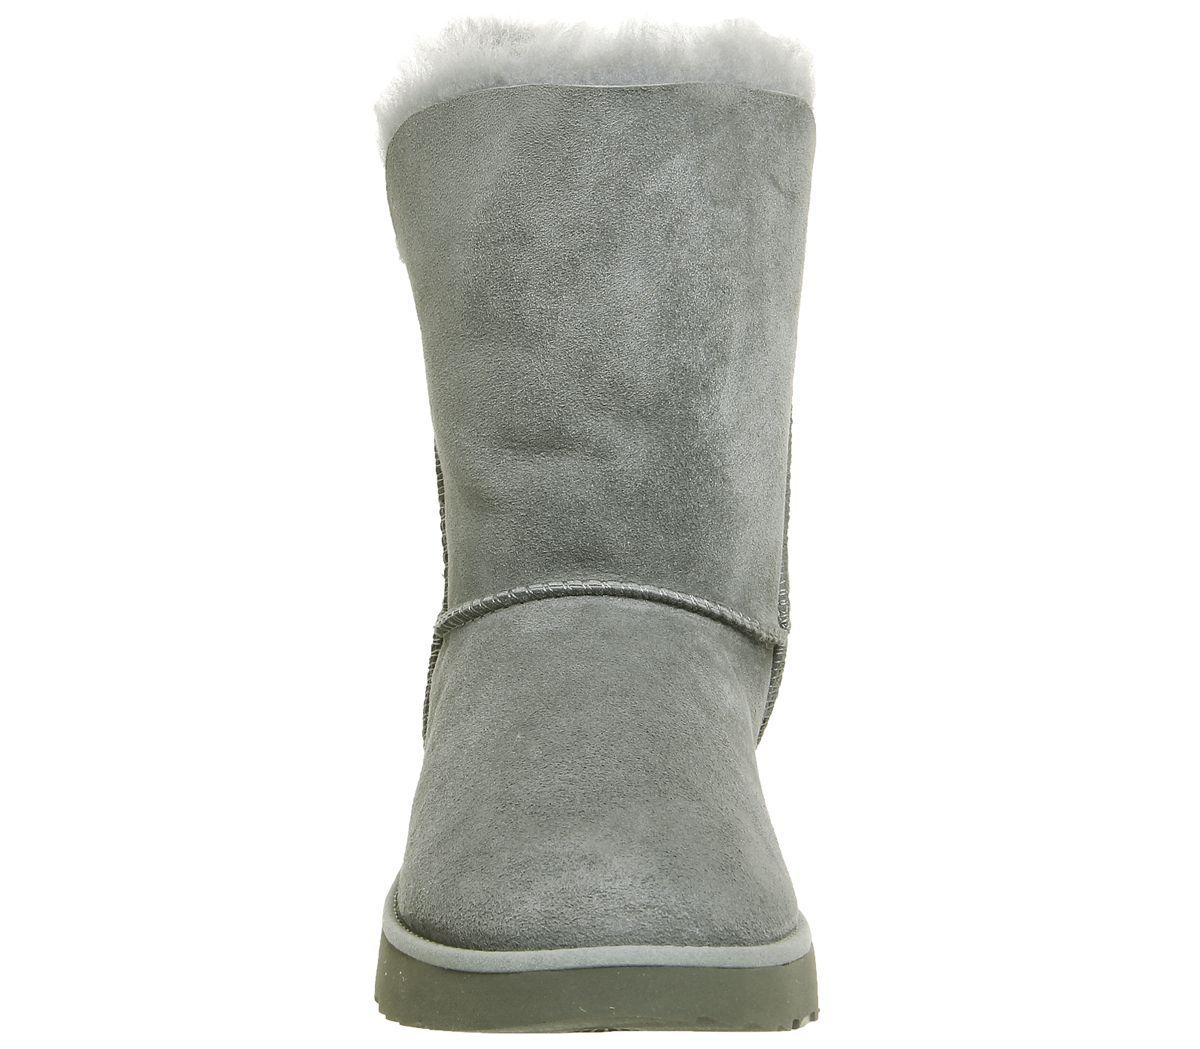 32c671fb805 Classic Cuff Short Boots